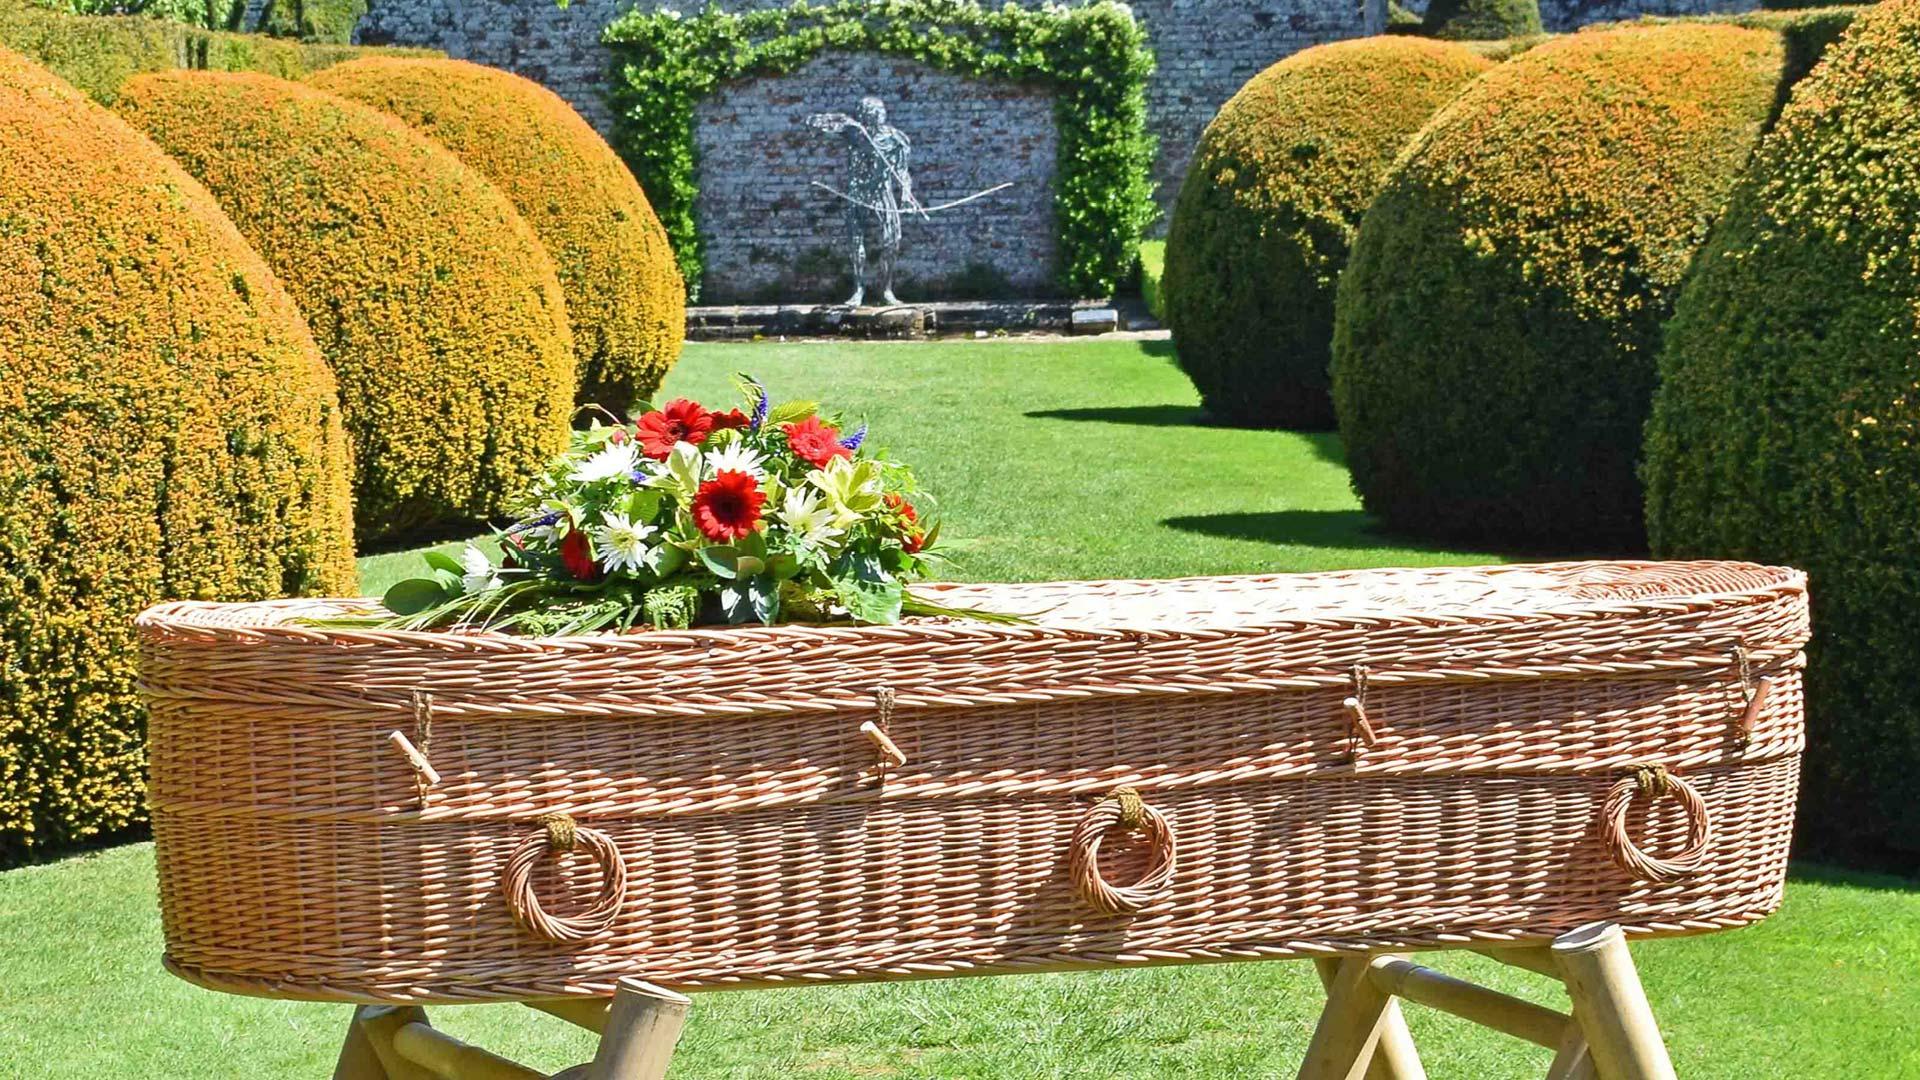 bio degradable coffin in garden